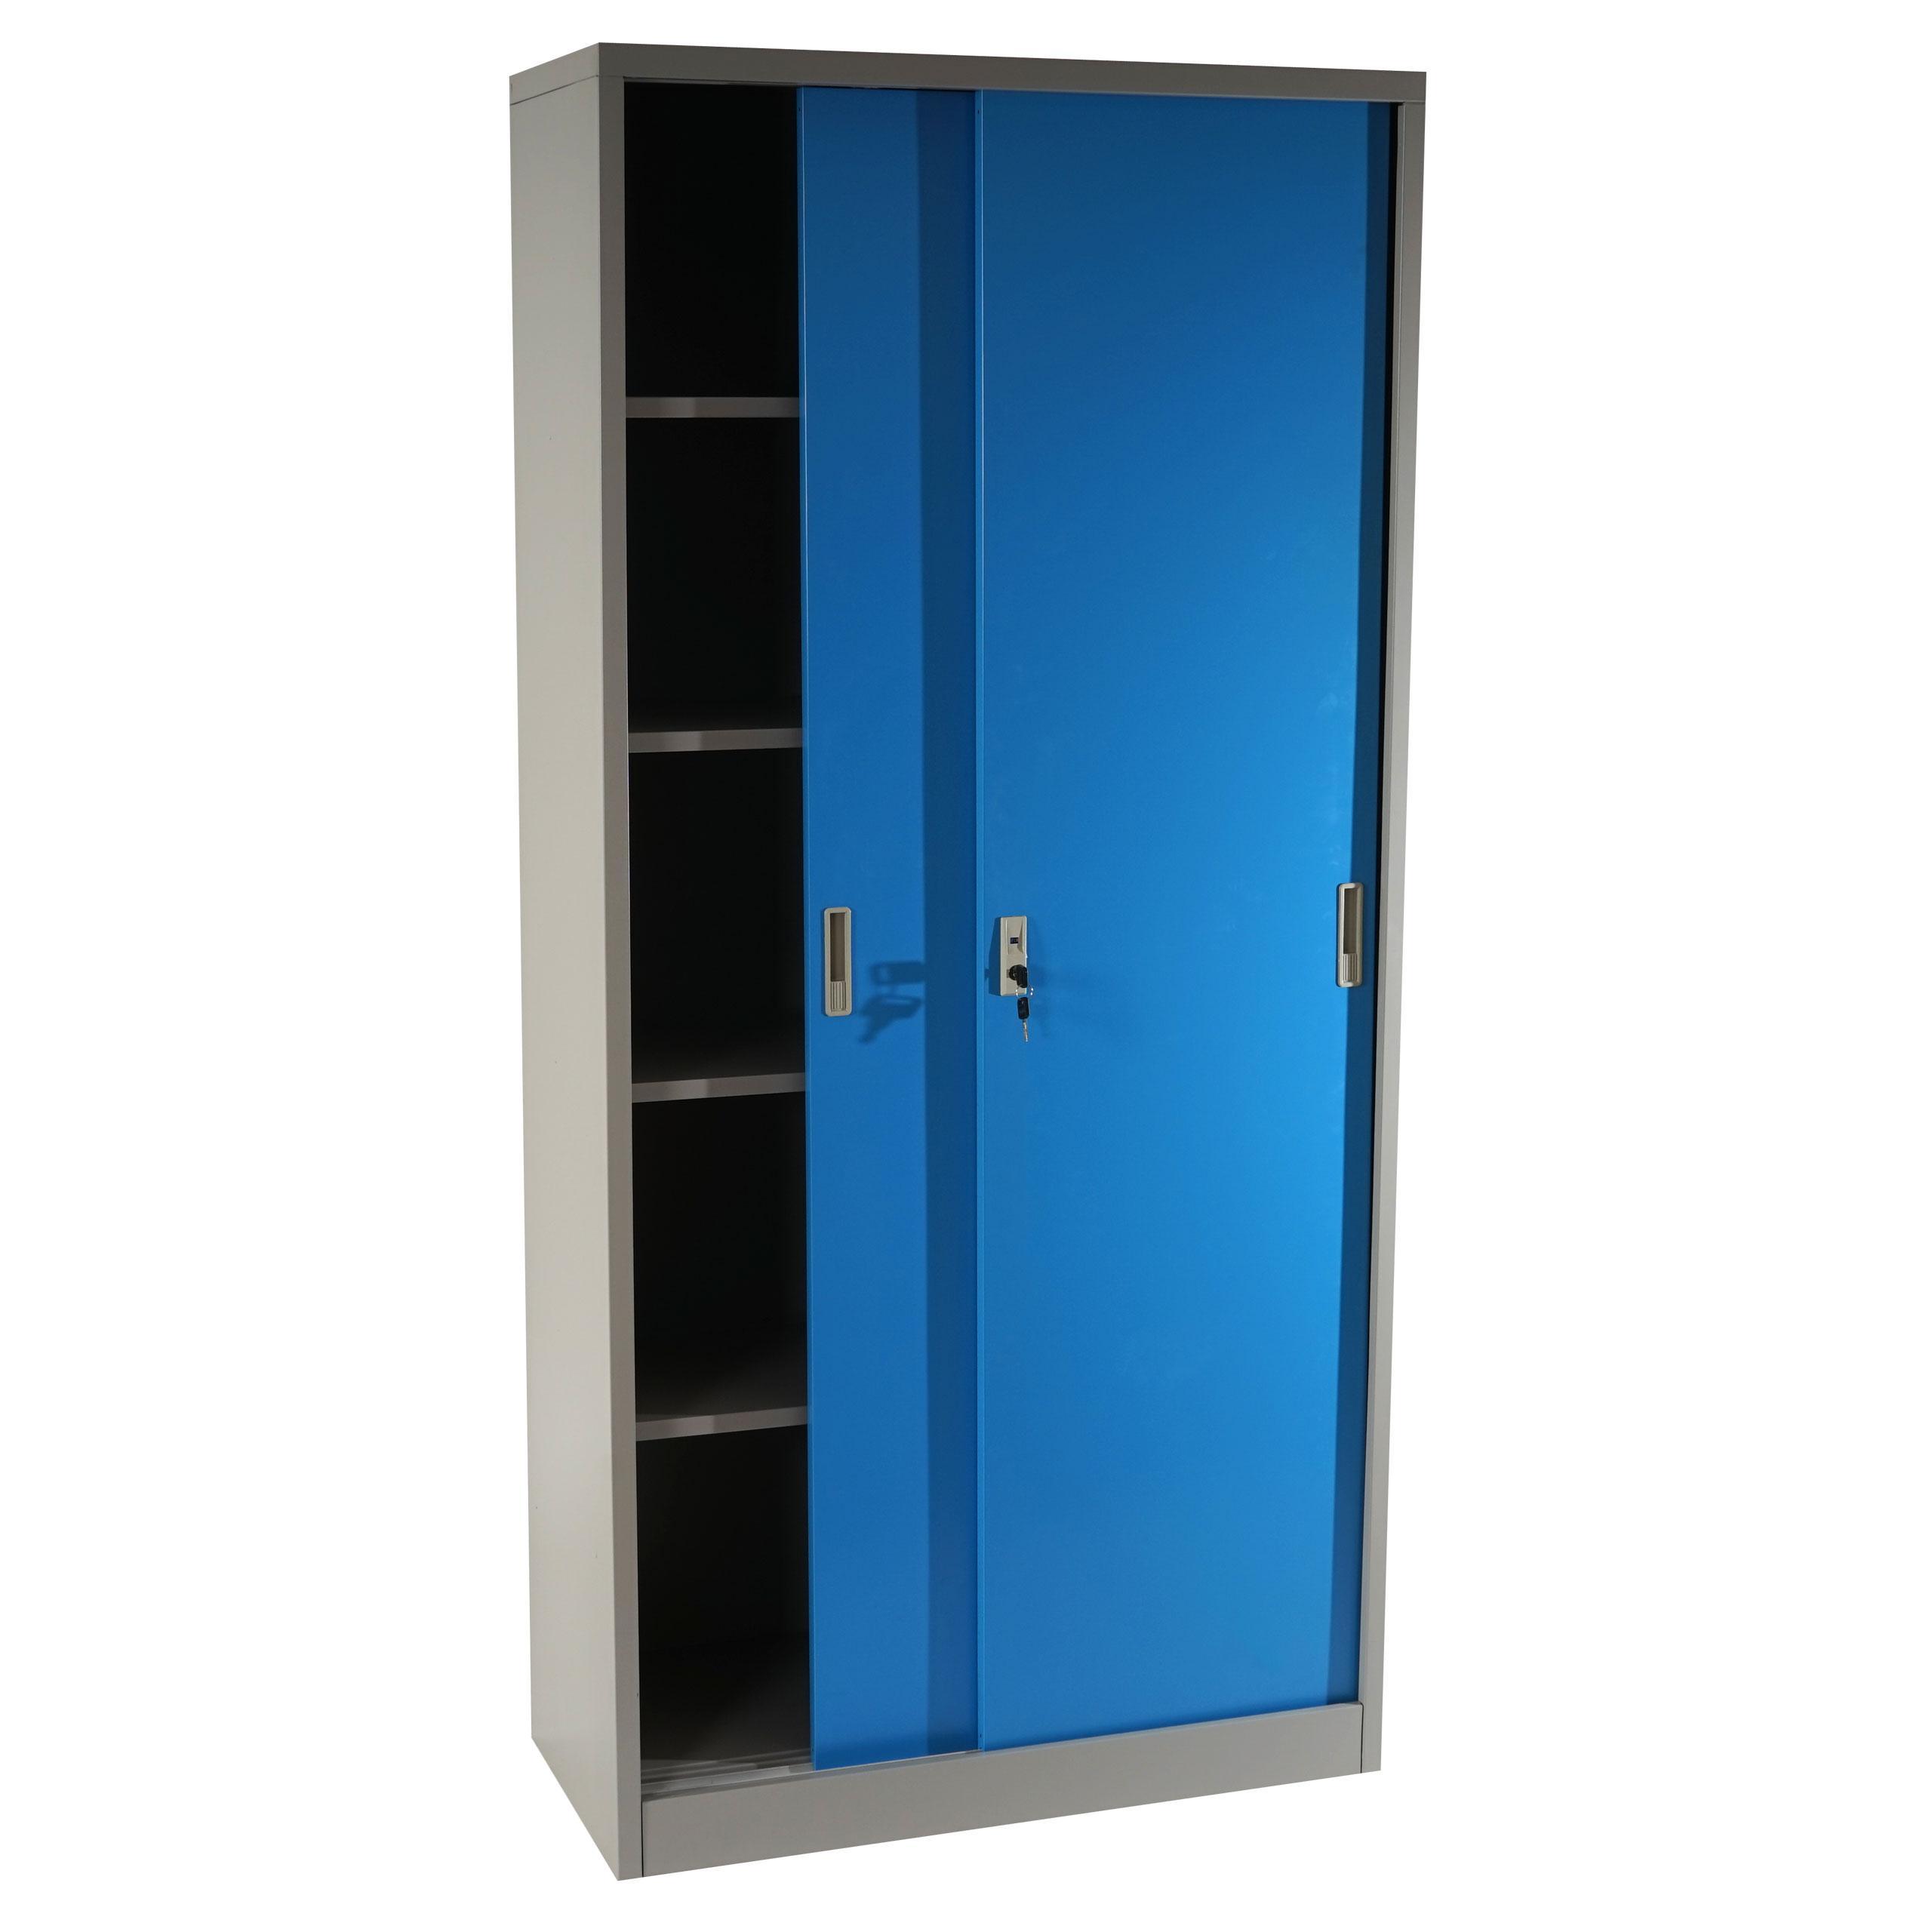 Armadio Metallo Due Ante Scorrevoli.Armadio Metallico Olsen Ante Scorrevoli Cm 180x85x40 In Acciaio Colore Blu